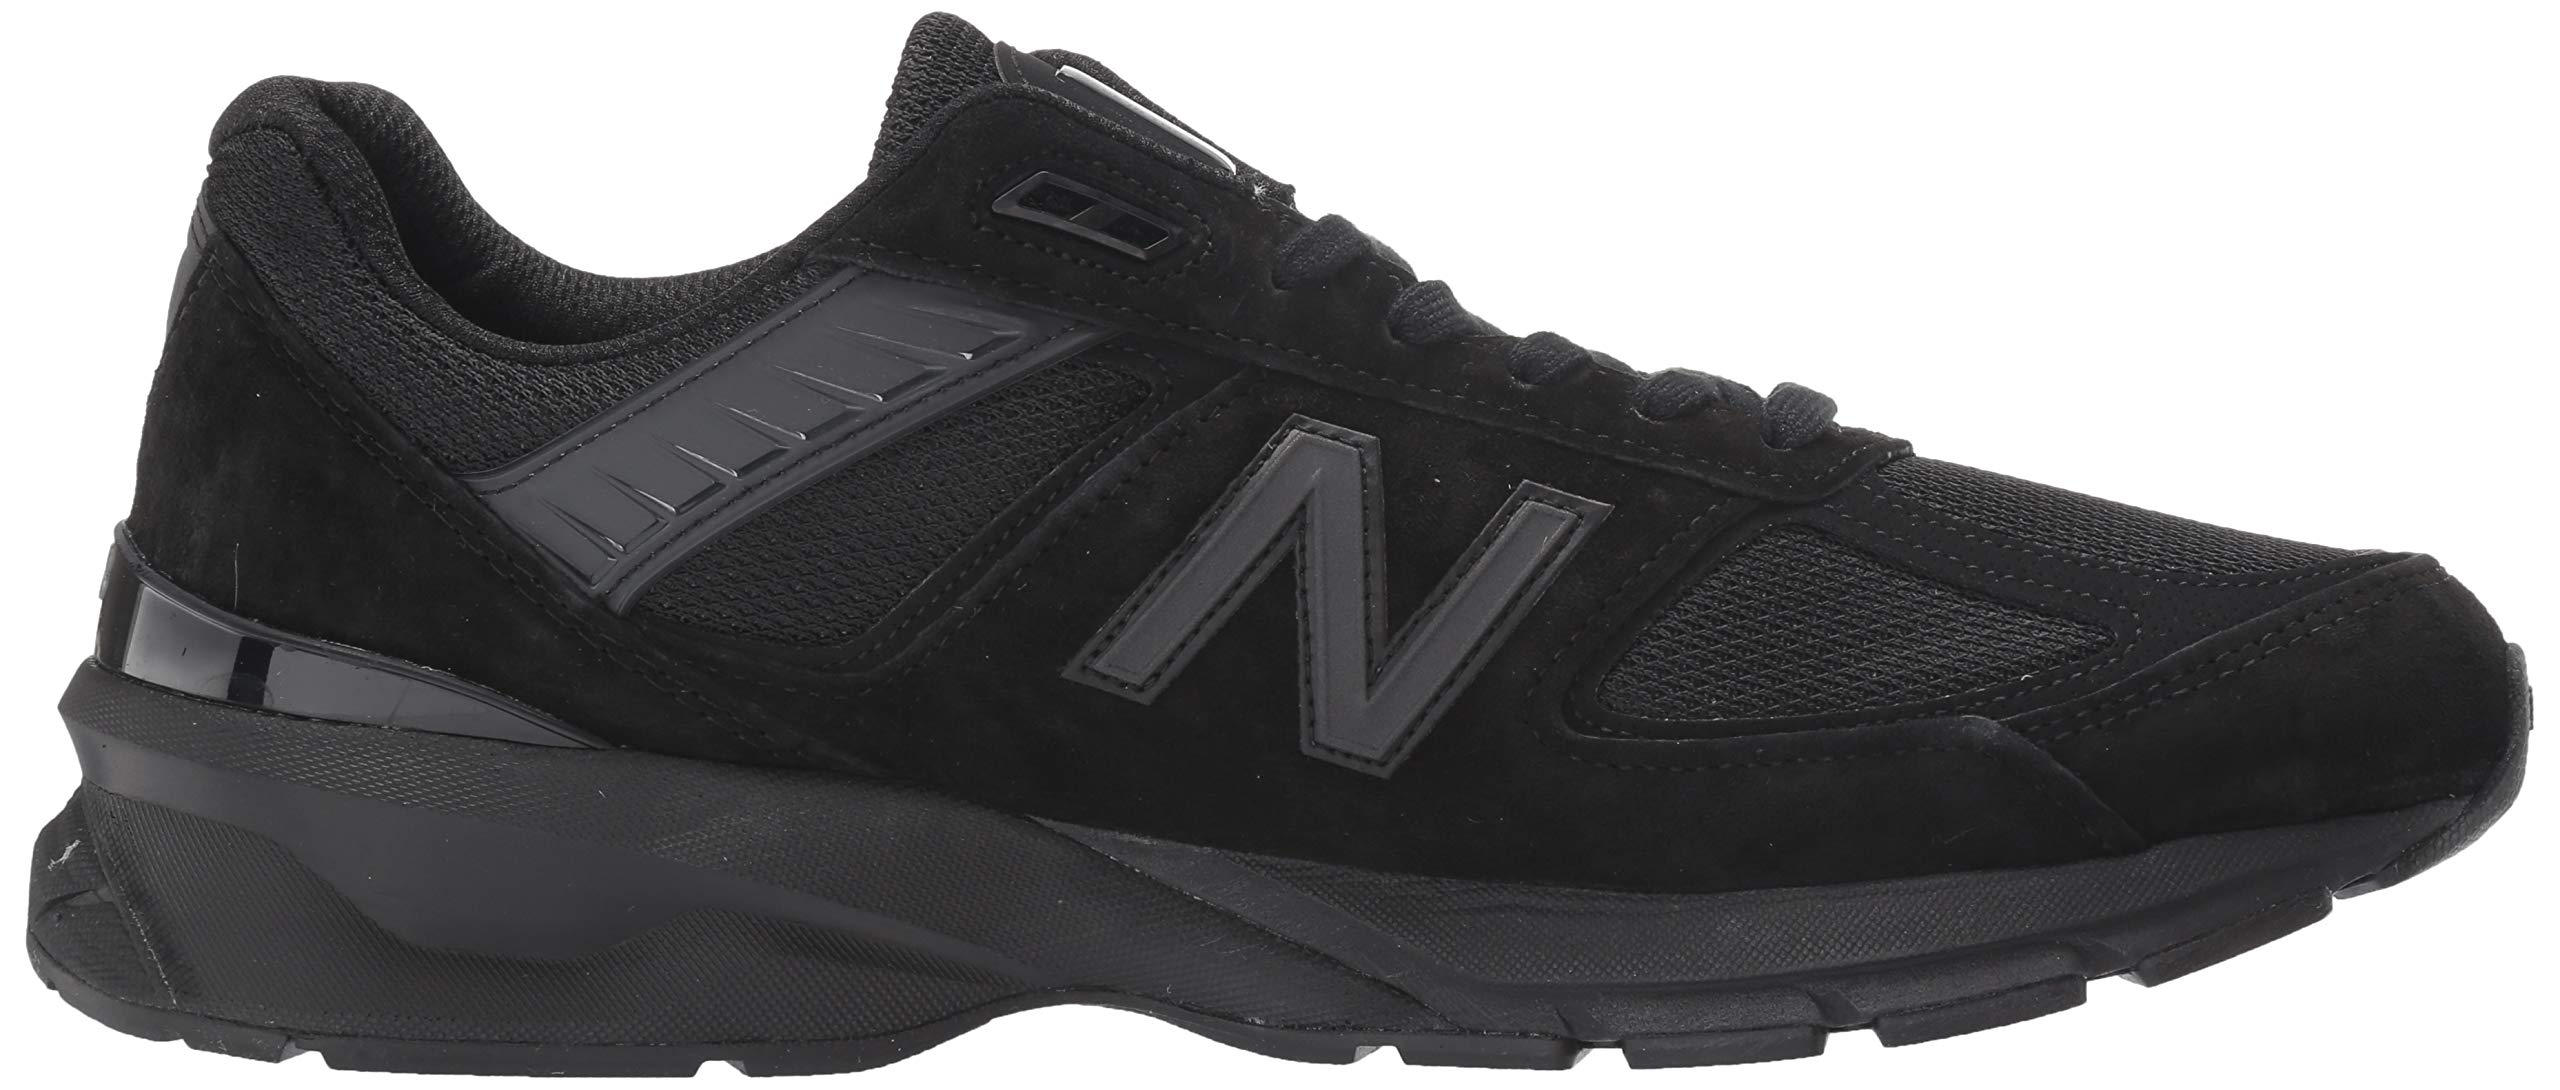 New-Balance-M990v5-Men-039-s-Made-in-USA-GL5-NV5-BK5-BB5 thumbnail 3